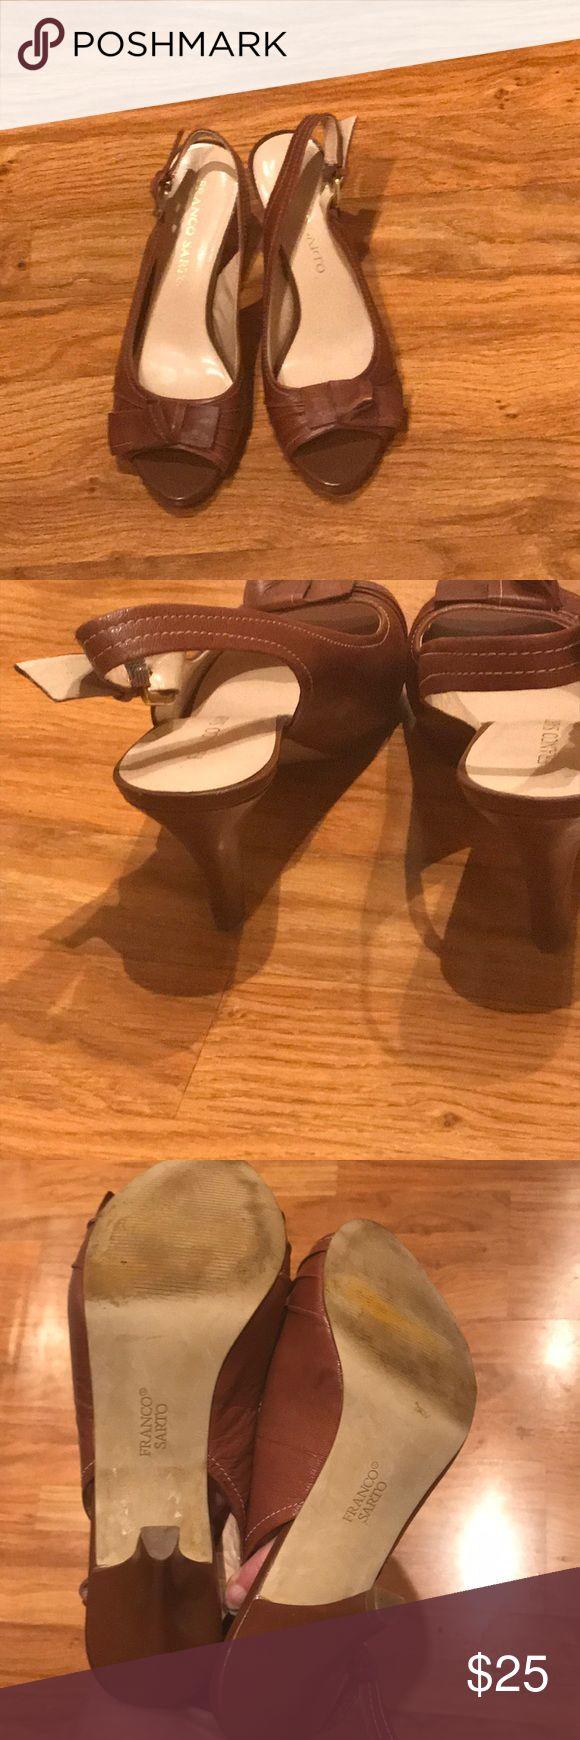 "Franco Sarto Astra Bow Peep Toe Heels Franco Sarto Astra size 7.5 Brown Bow Peep Toe Heels.  Heel is 3.5"". Franco Sarto Shoes Heels"